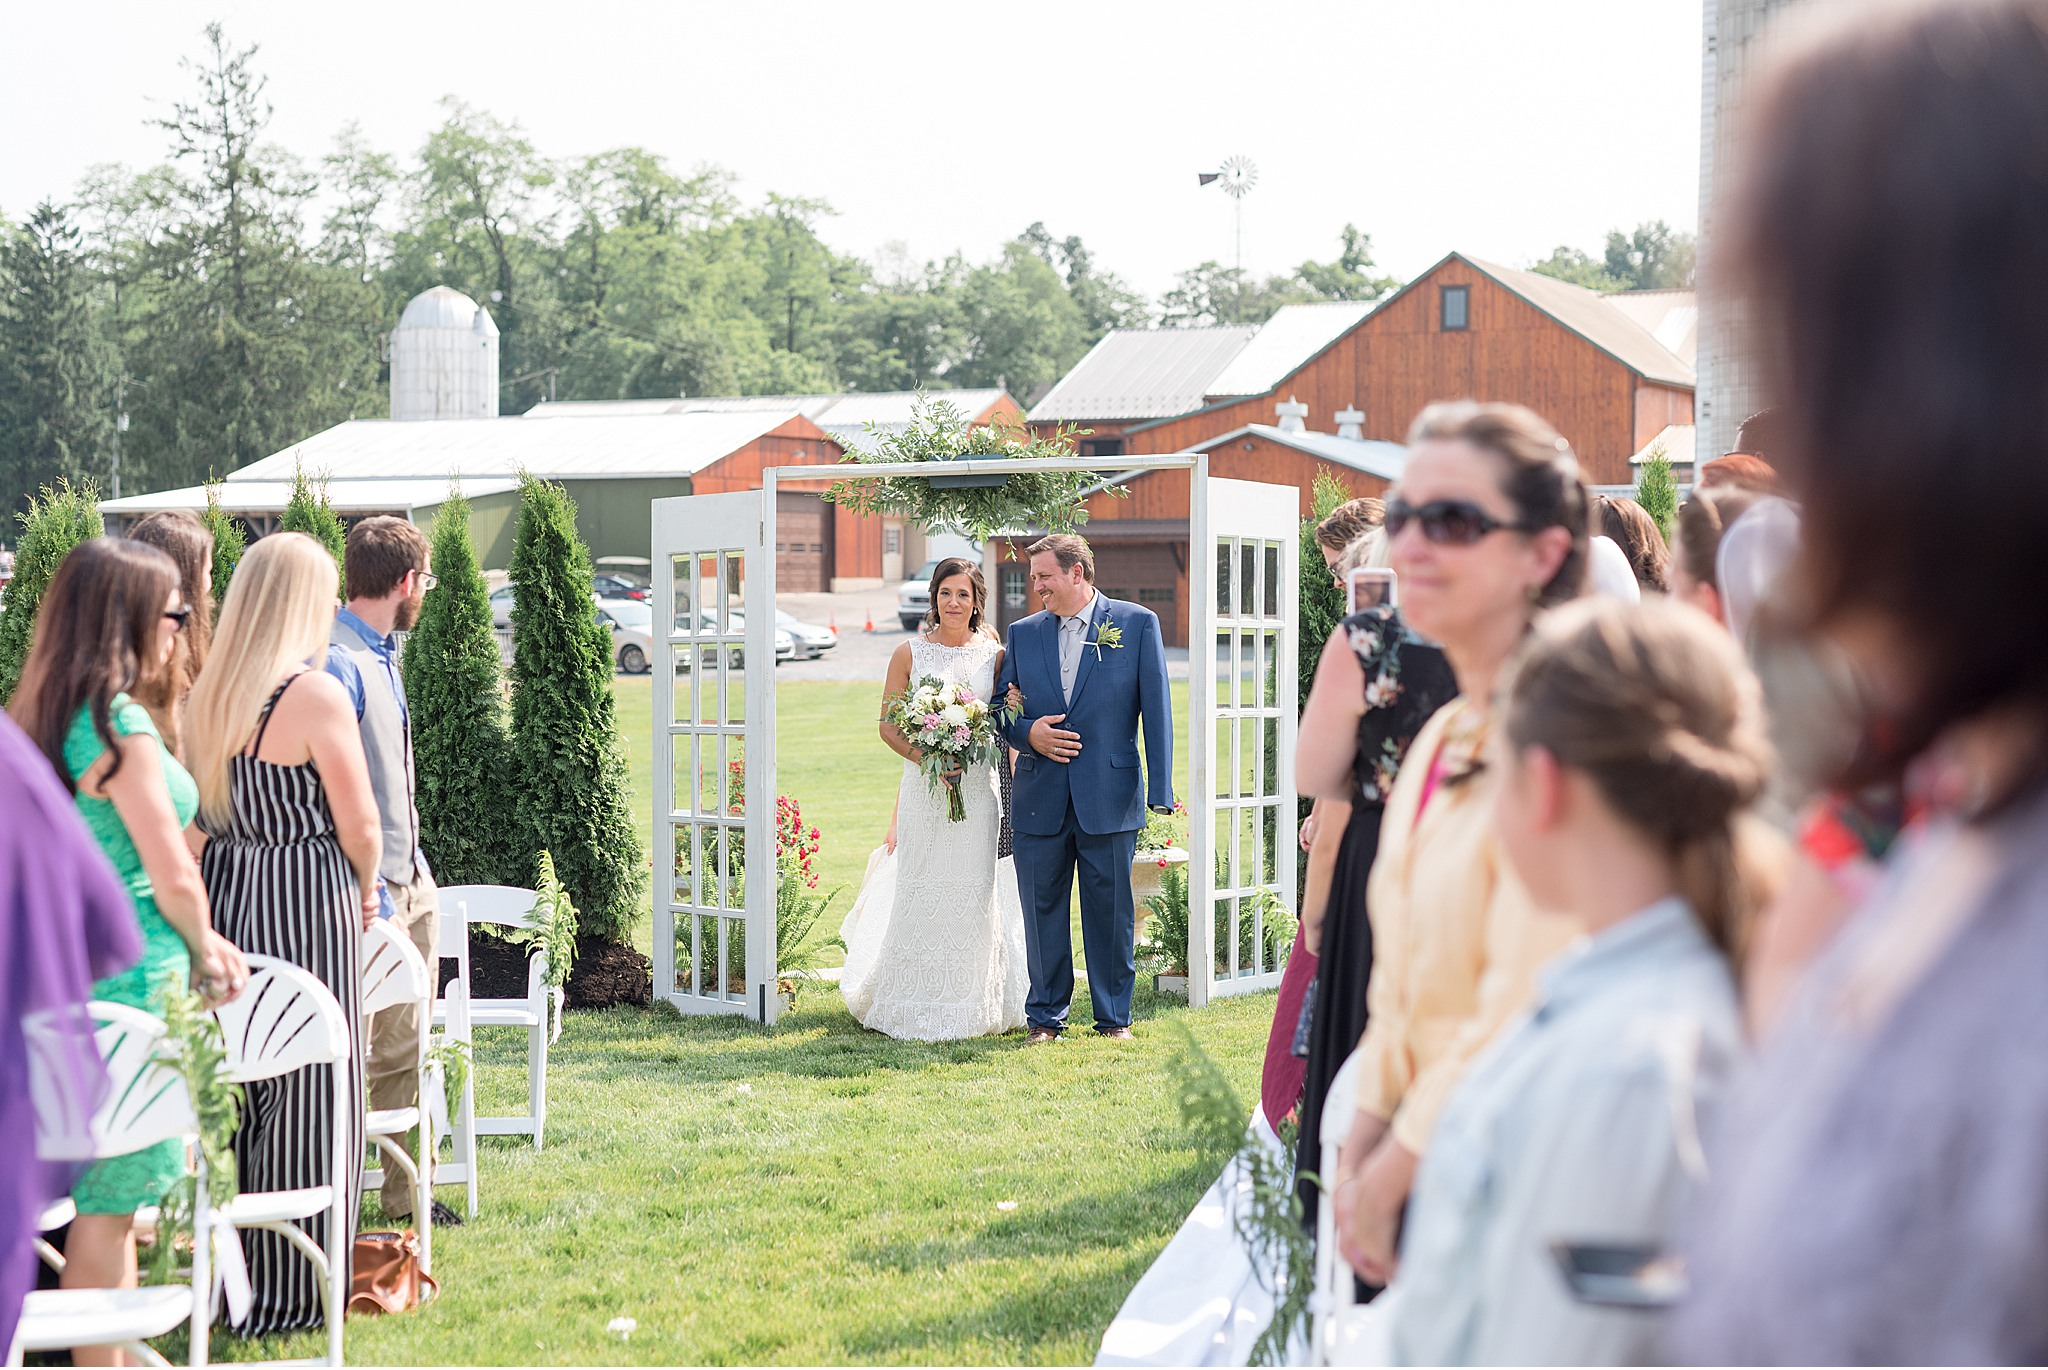 Simmontown wedding Barn Lancaster PA wedding engagement Photography_3614.jpg